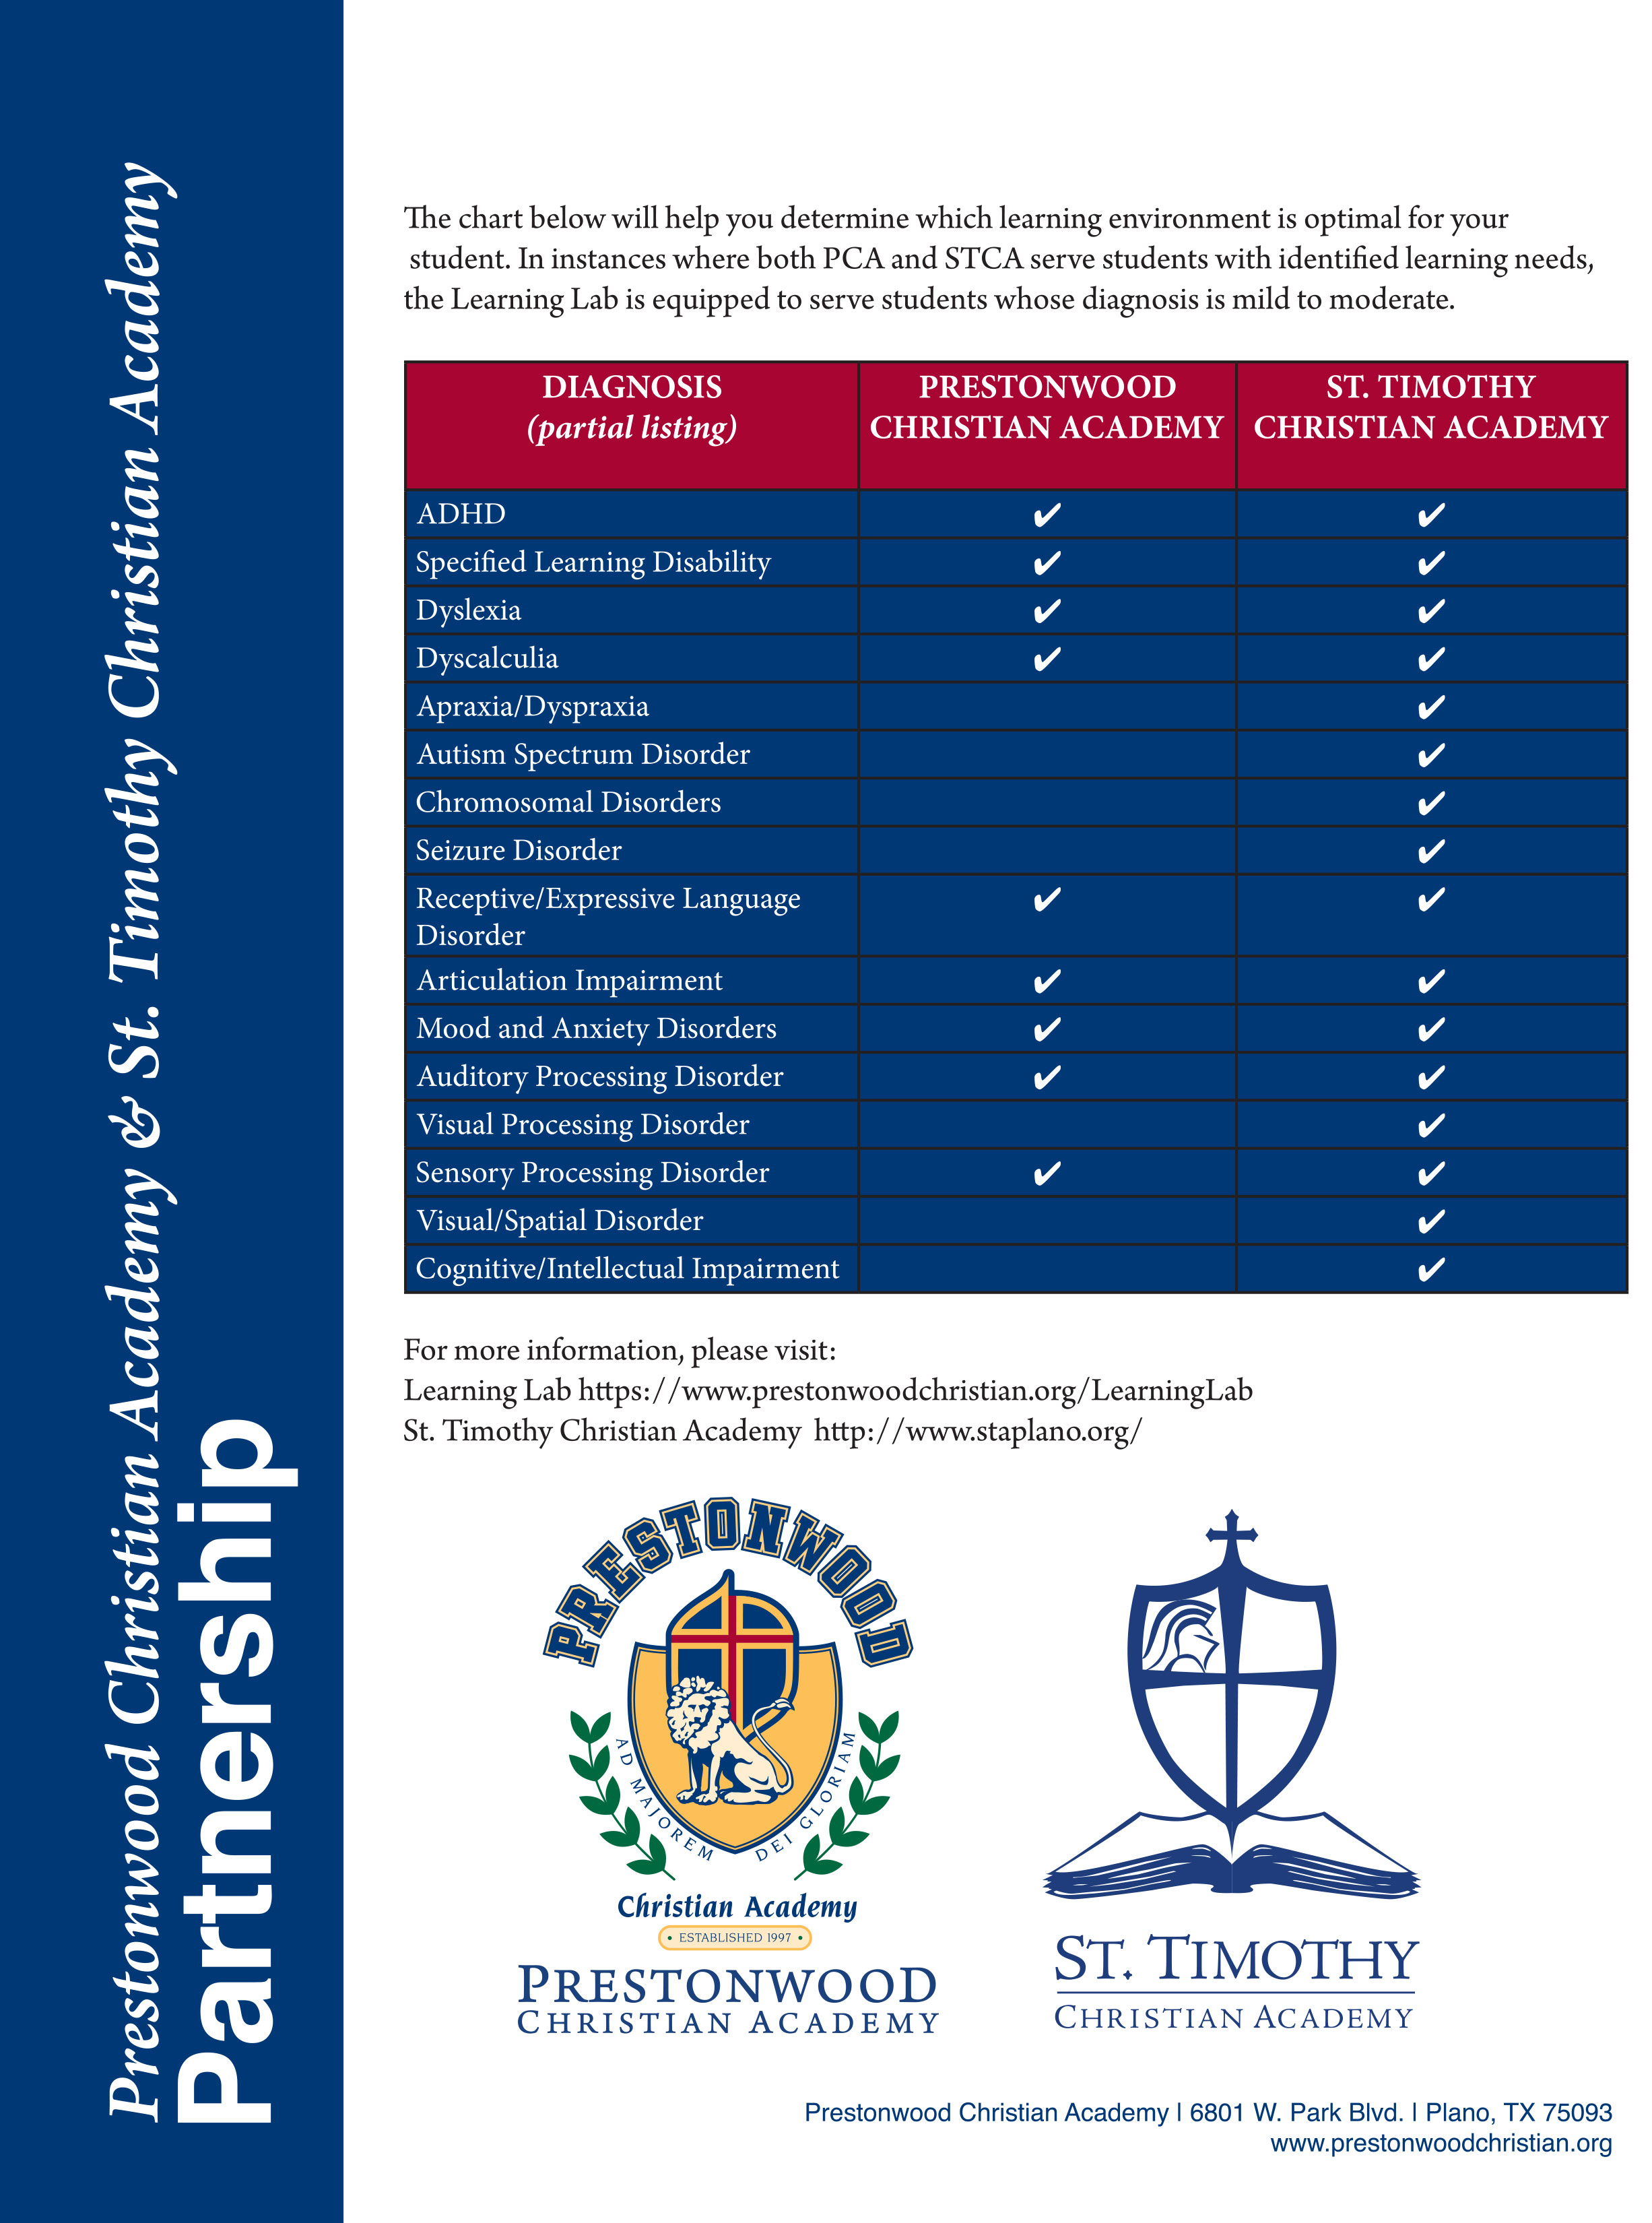 State of School - Prestonwood Christian Academy